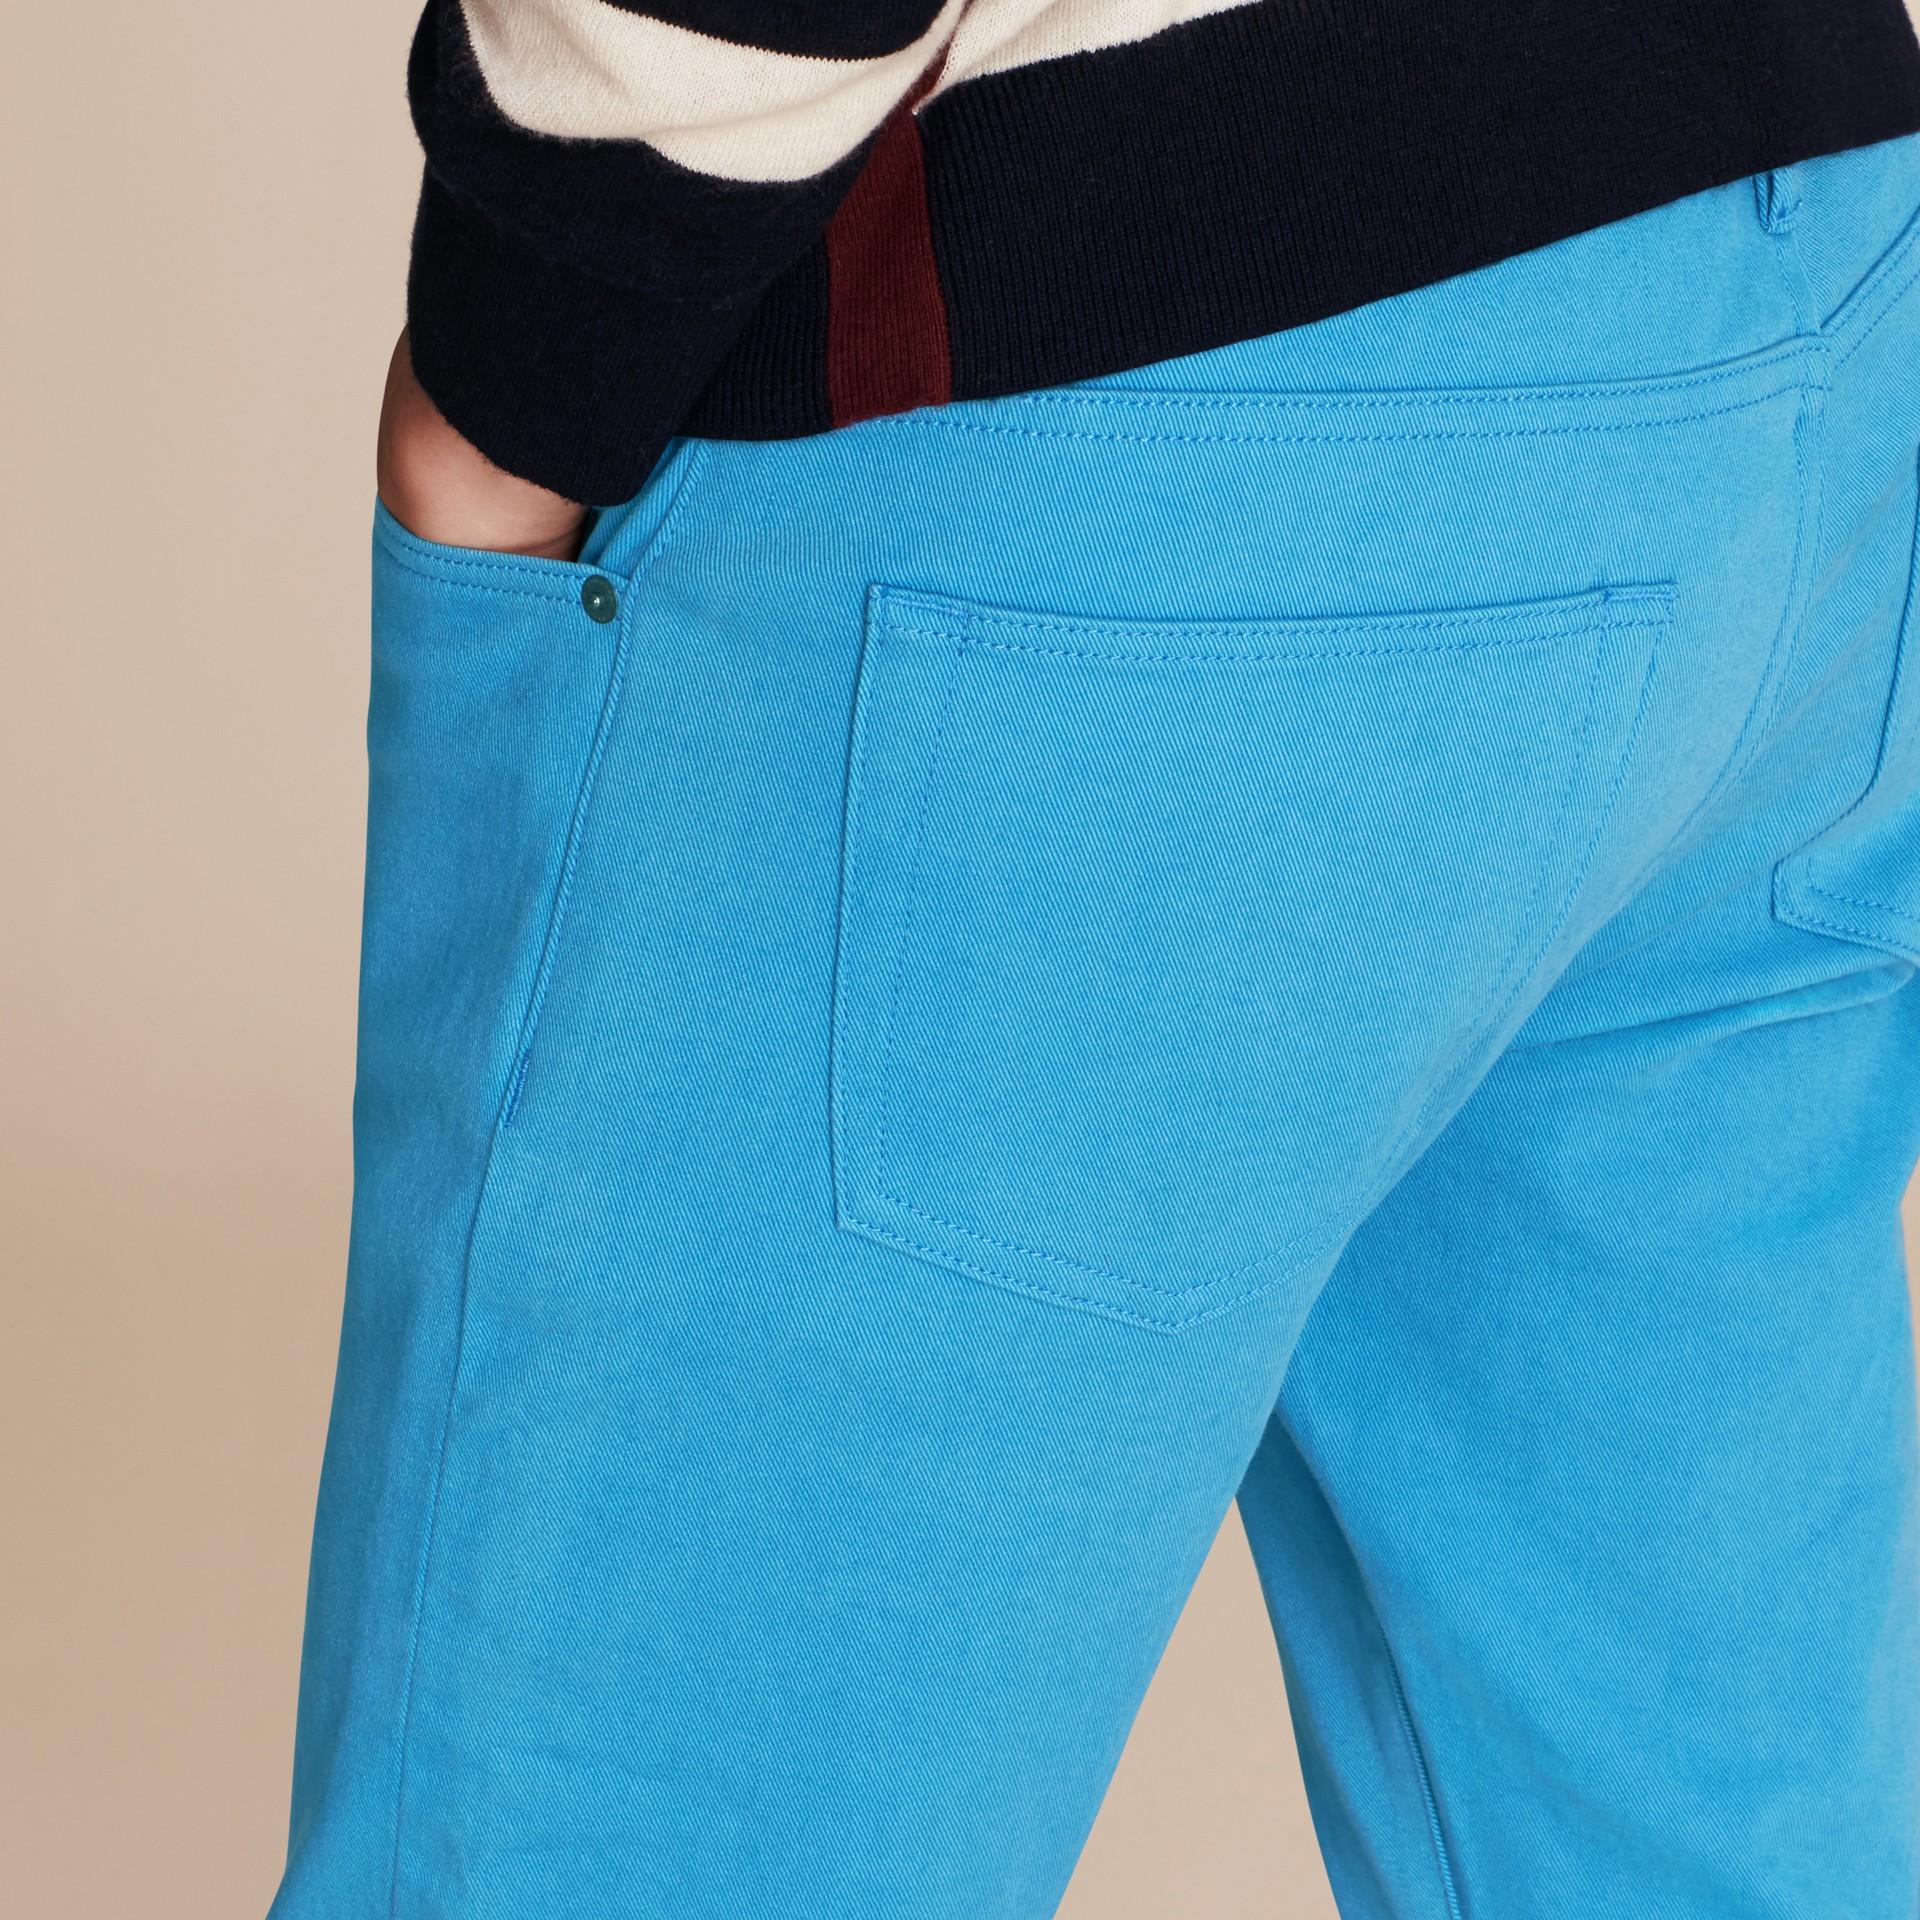 Slim Fit Japanese Stretch Denim Jeans Cerulean Blue - gallery image 6